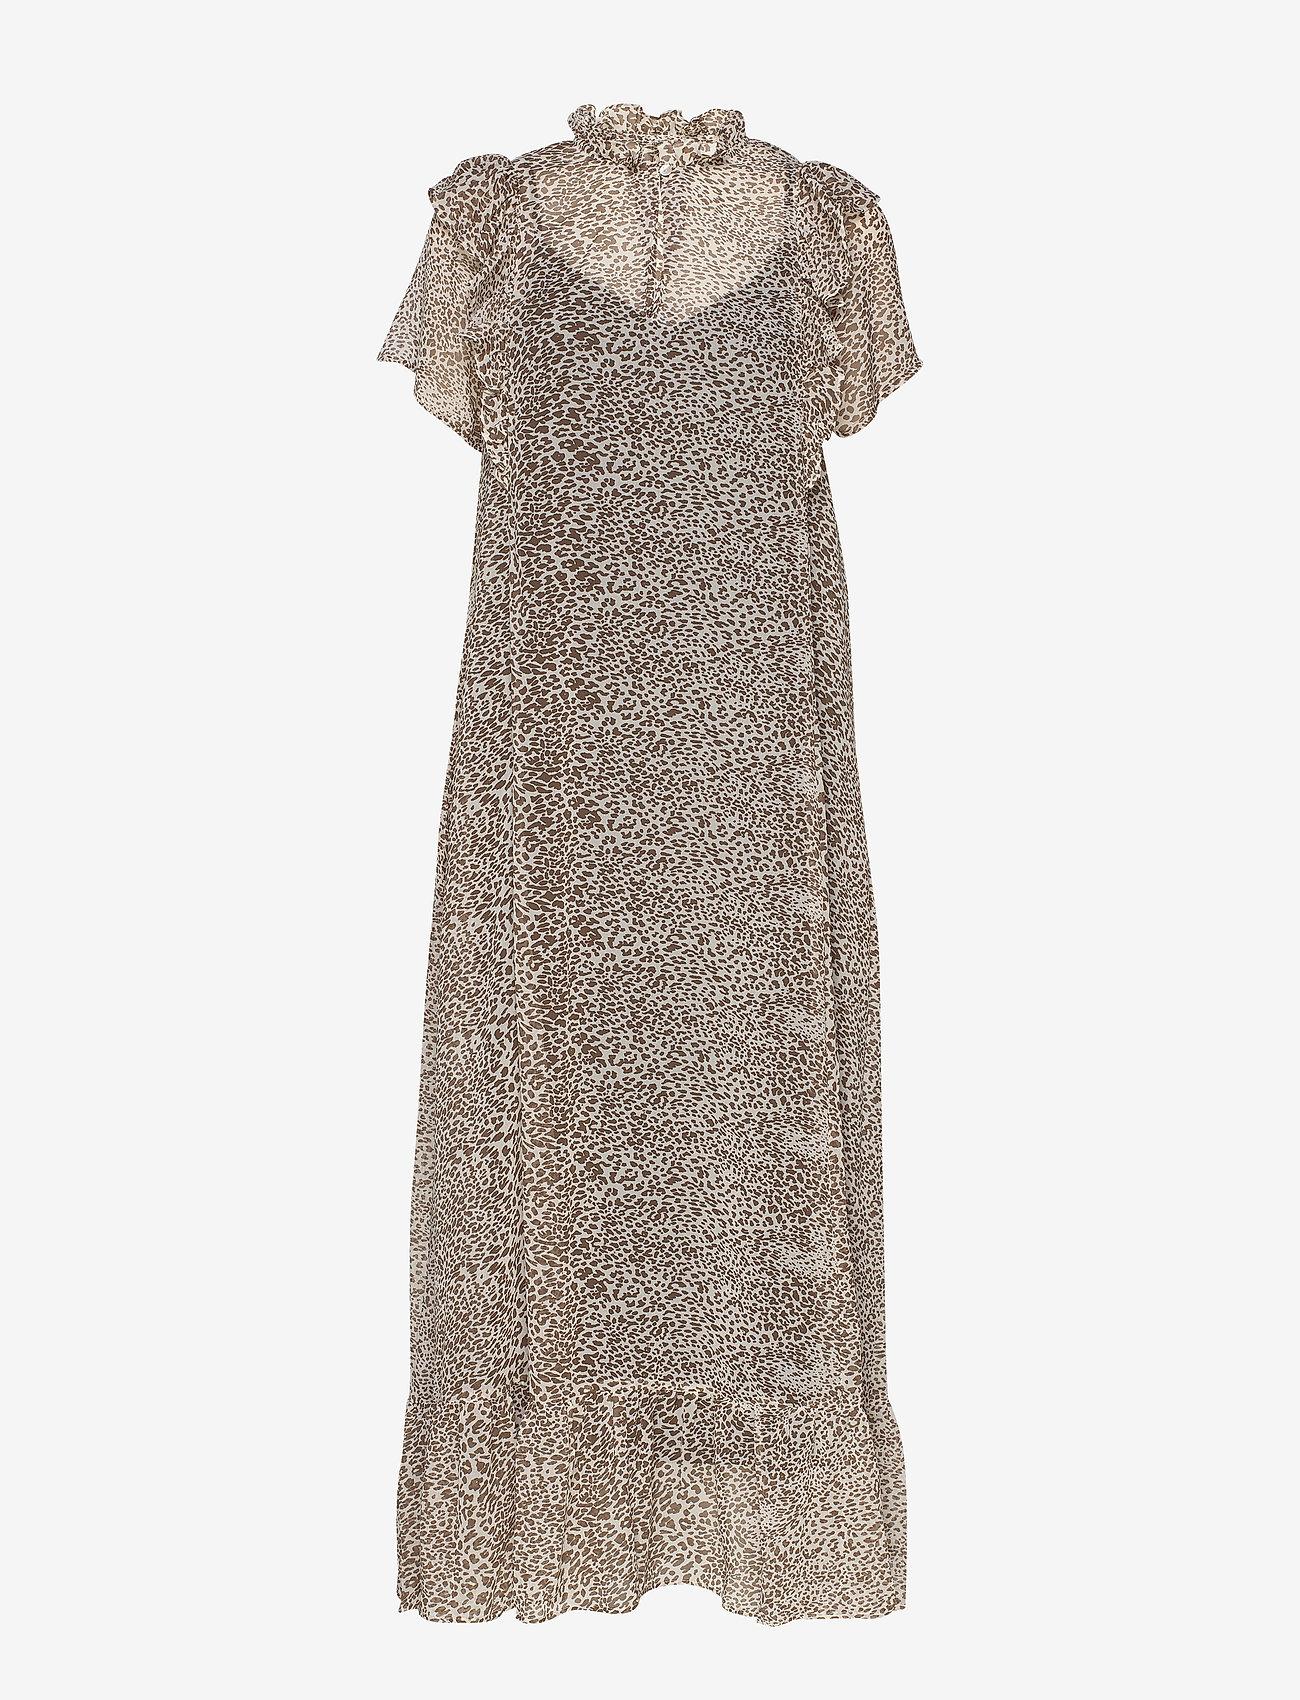 Ricca Dress (Leopard Print) (810 kr) - Lollys Laundry